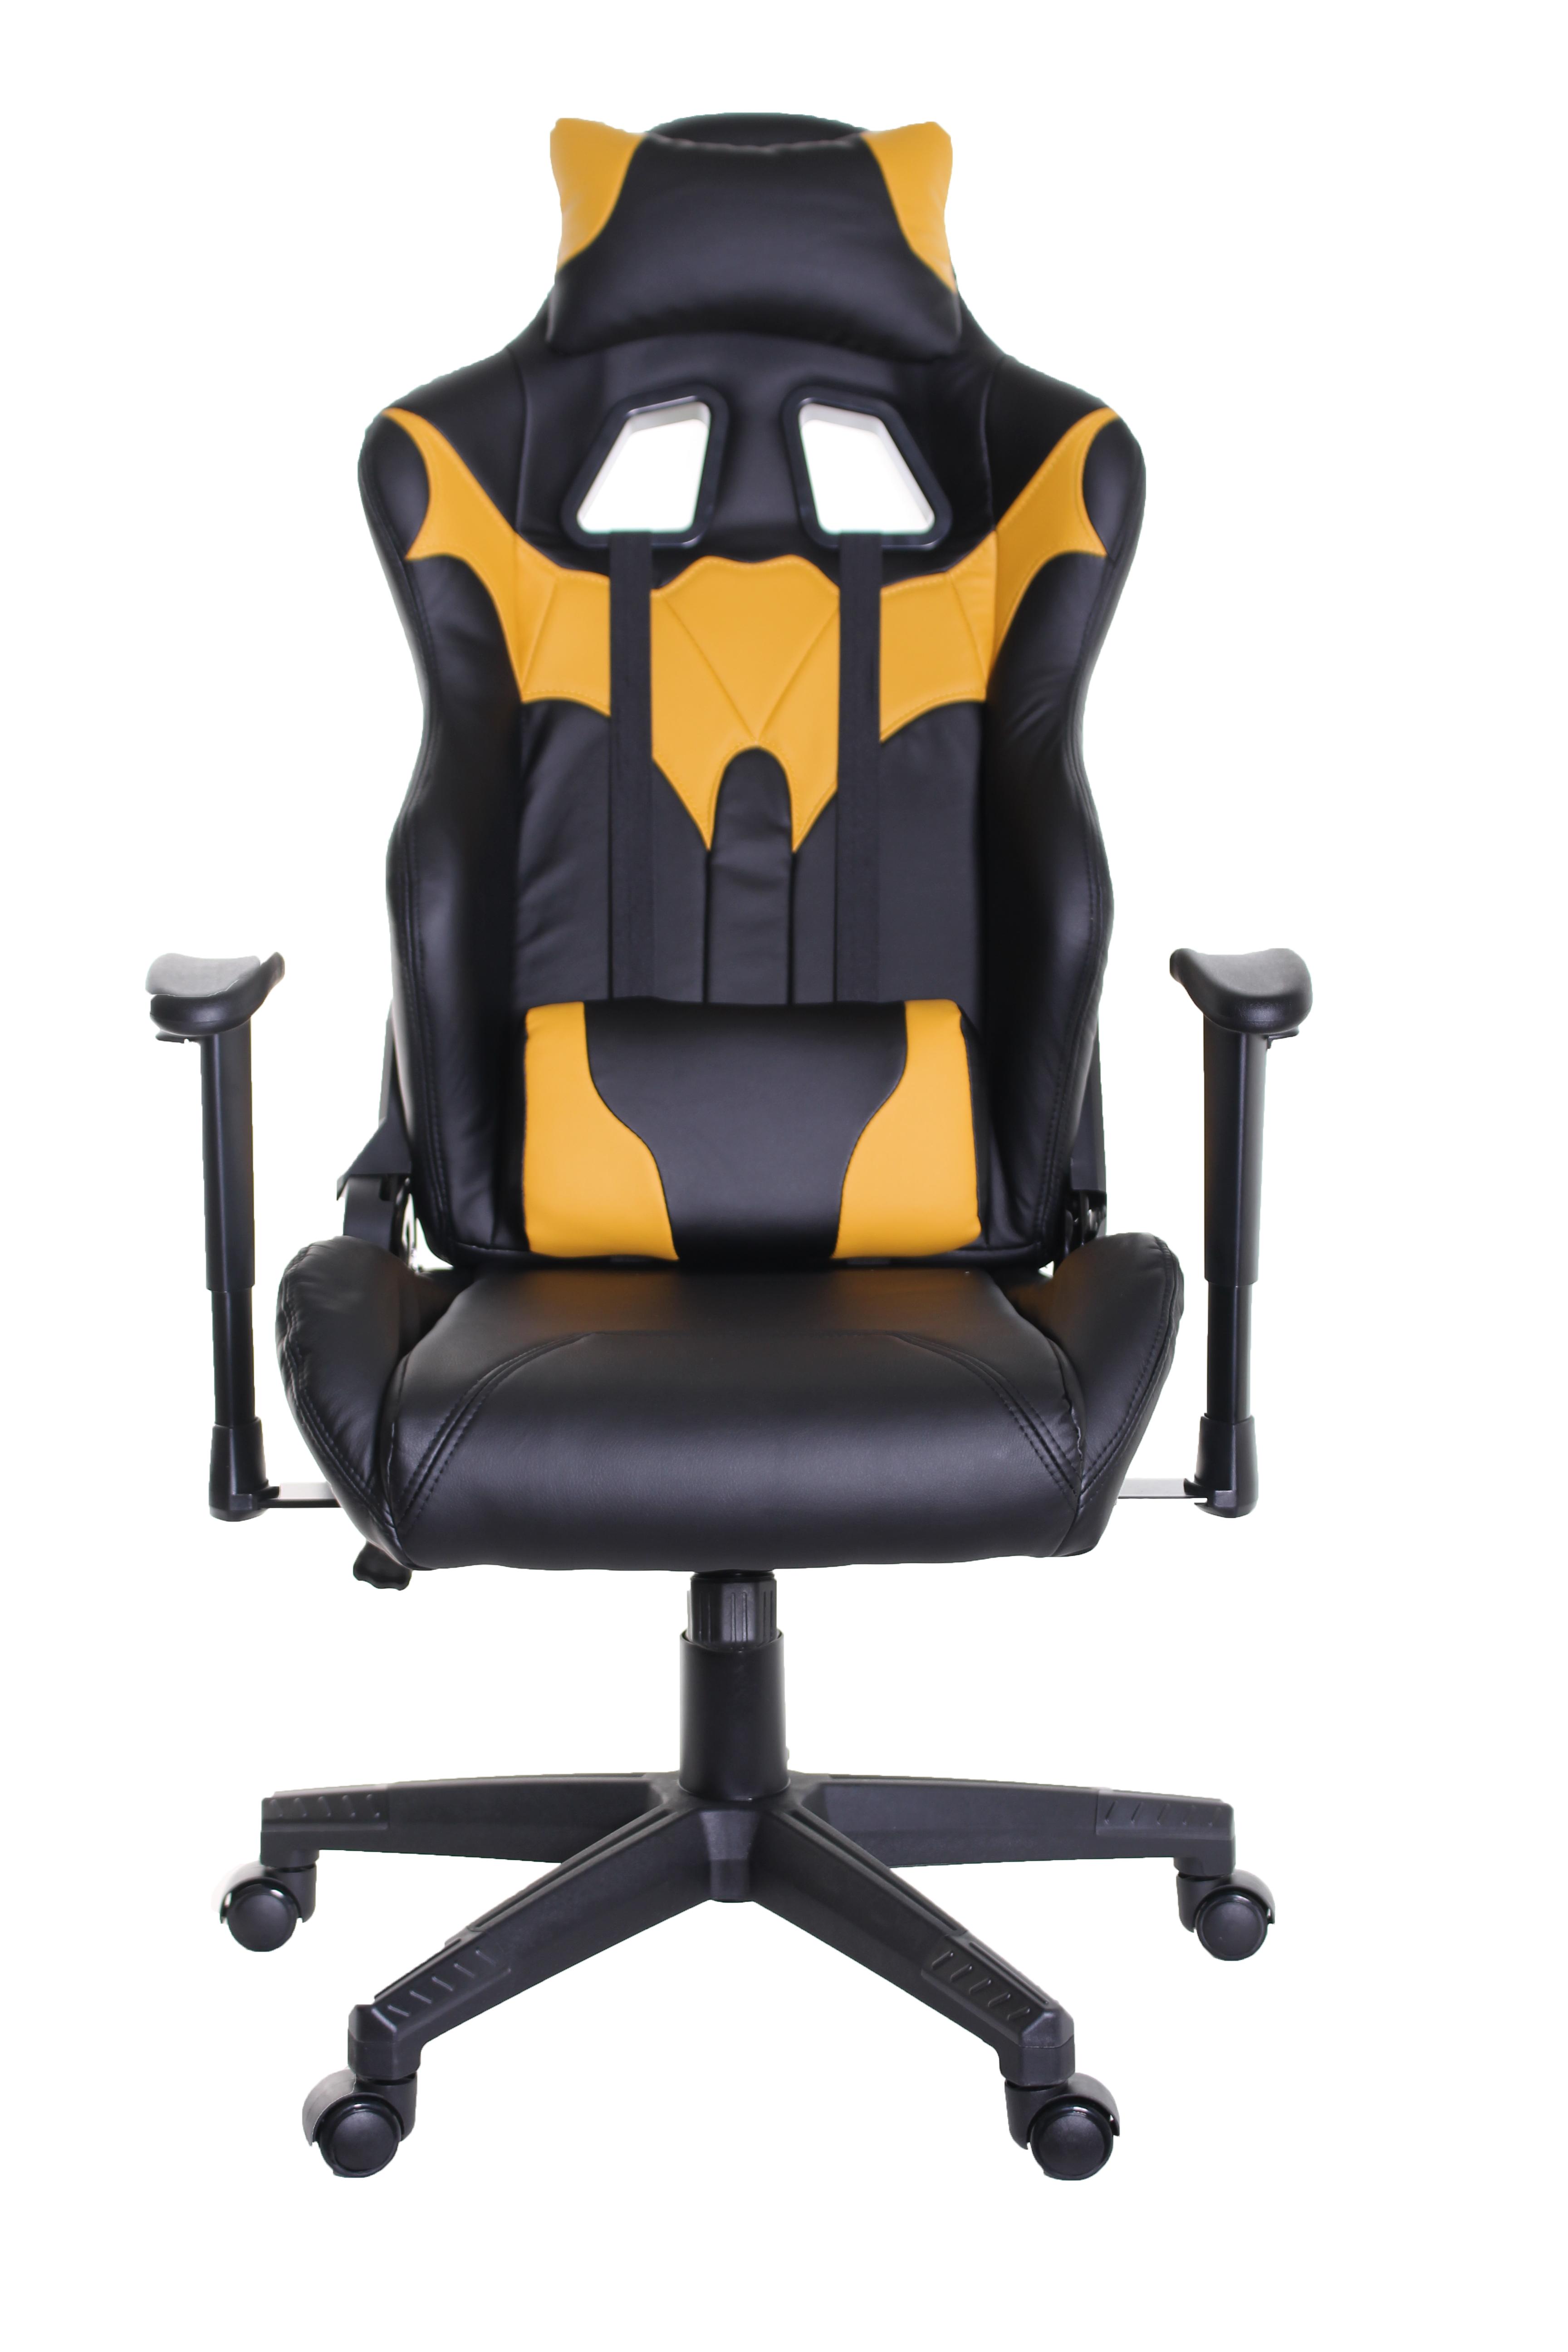 TimeOffice Batman Series Ergonomic Video Gaming Chair This